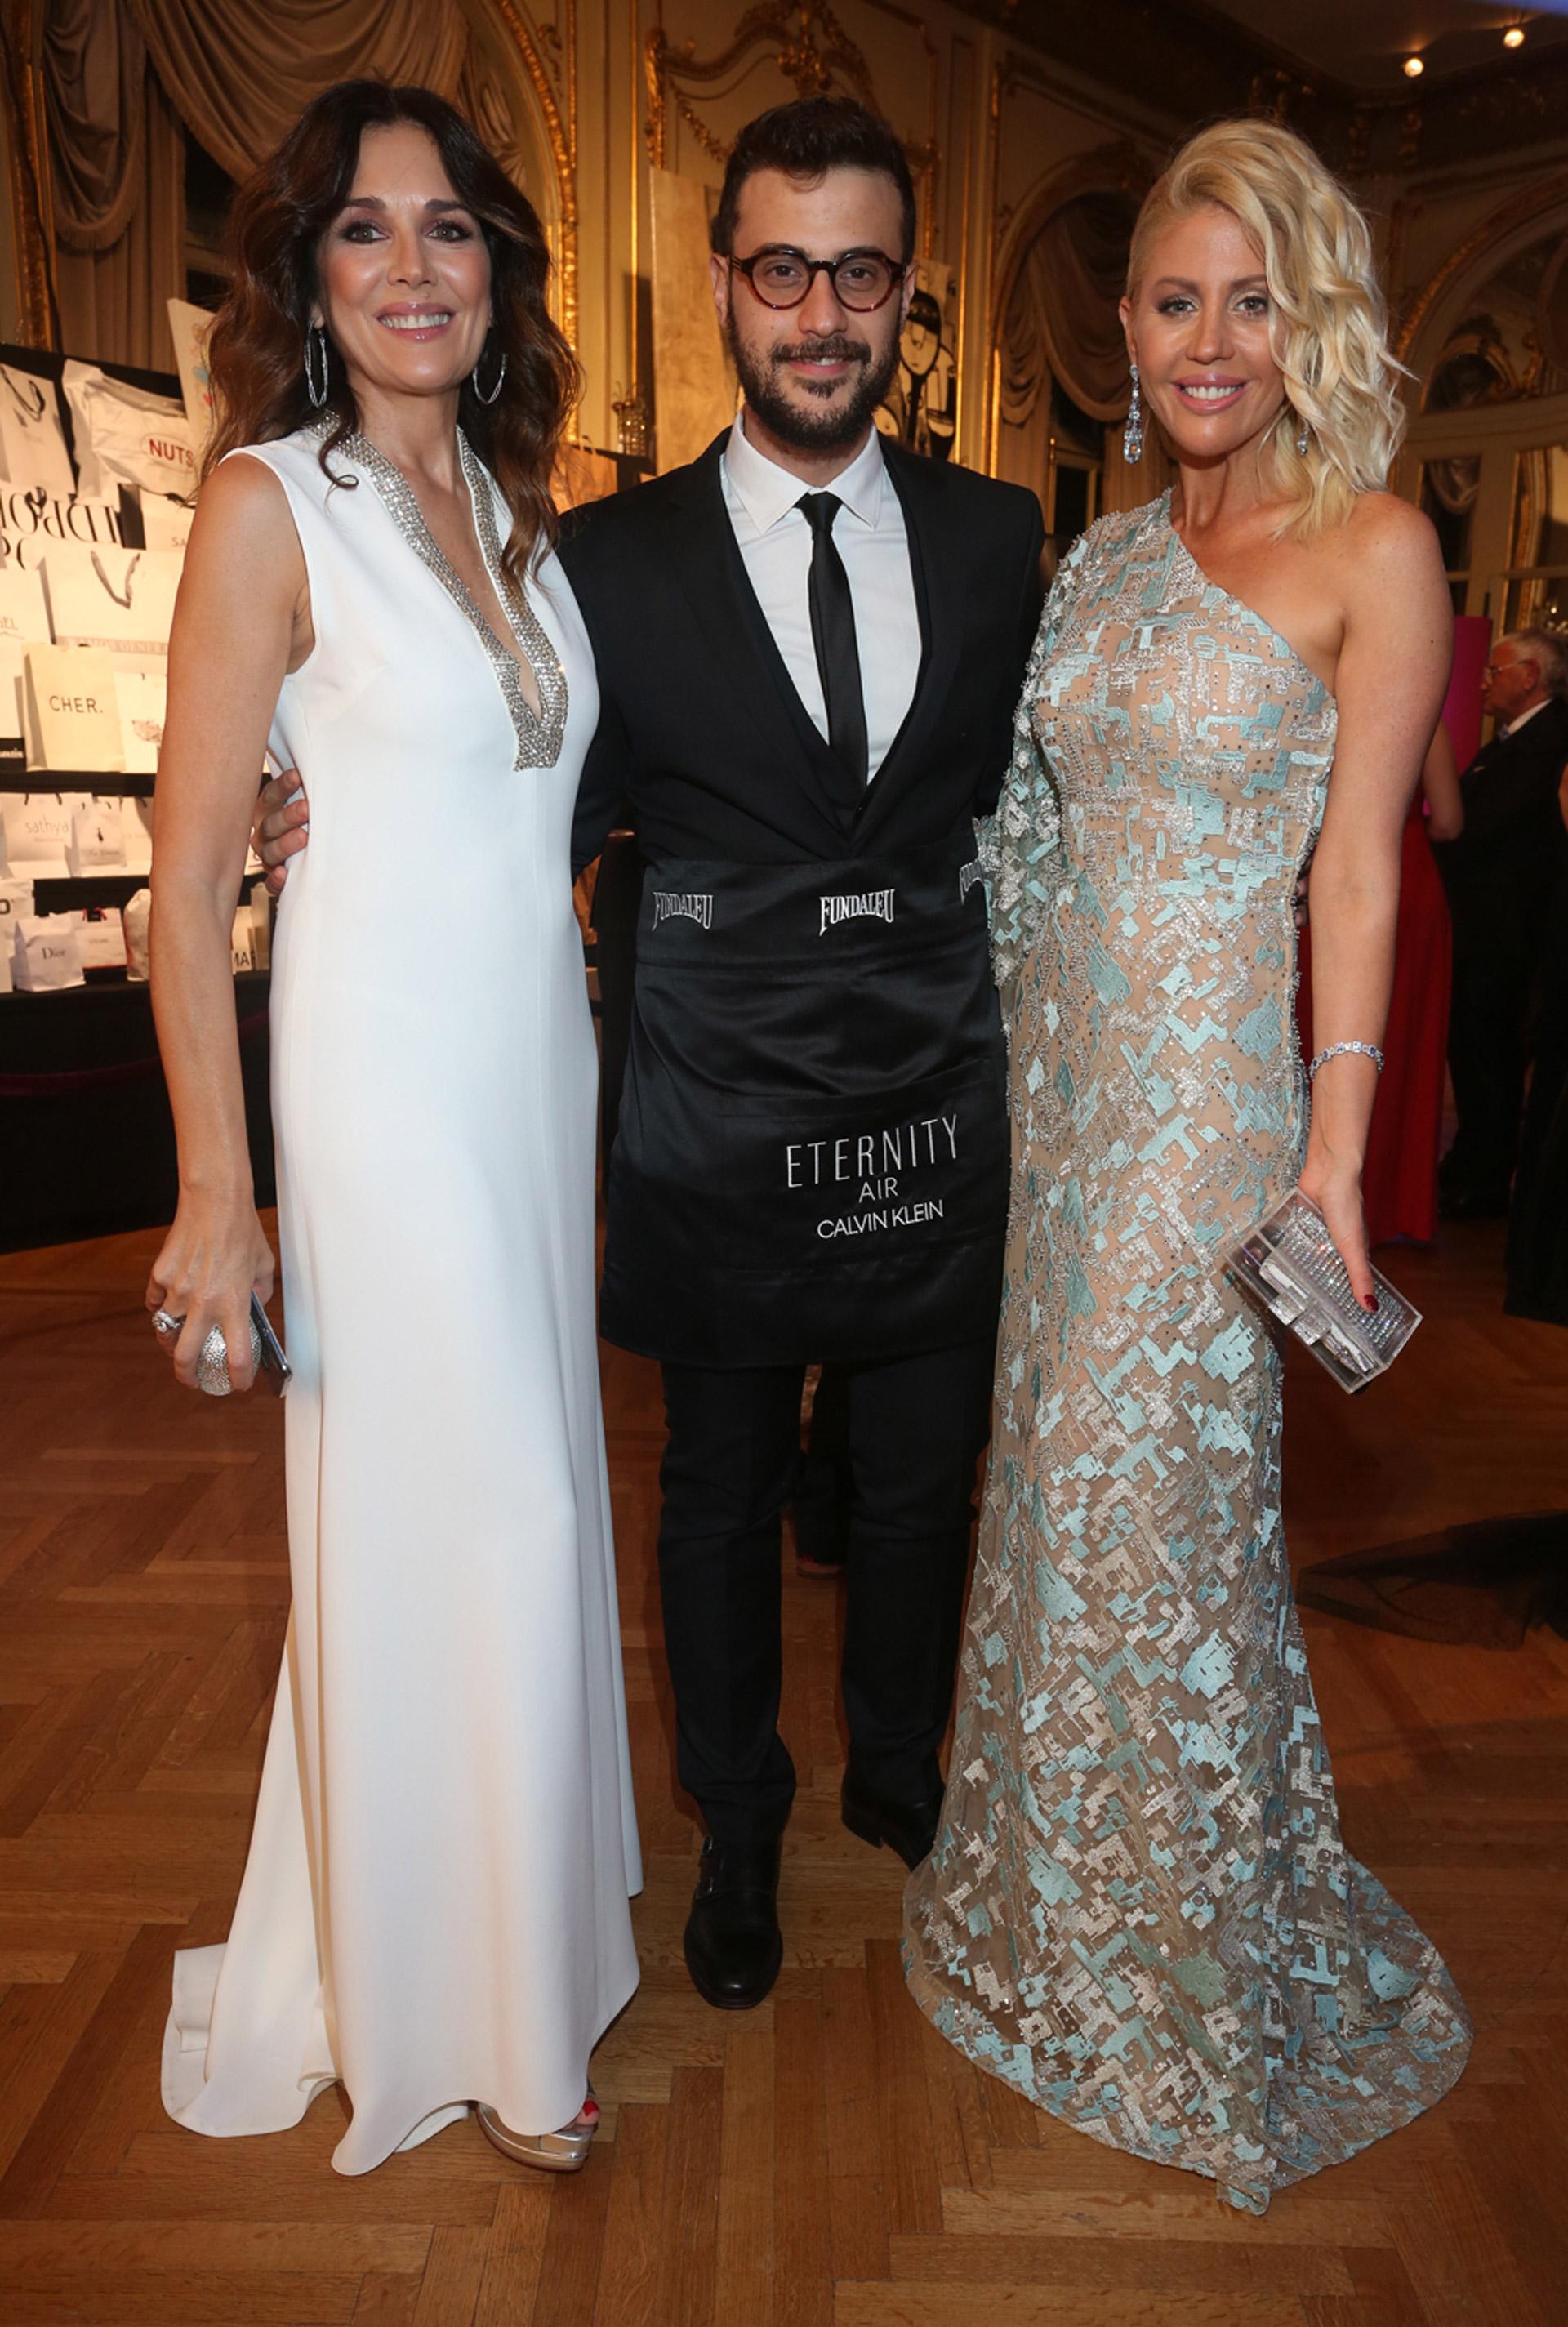 Andrea Frigerio, Diego Leuco y Barbie Simmons